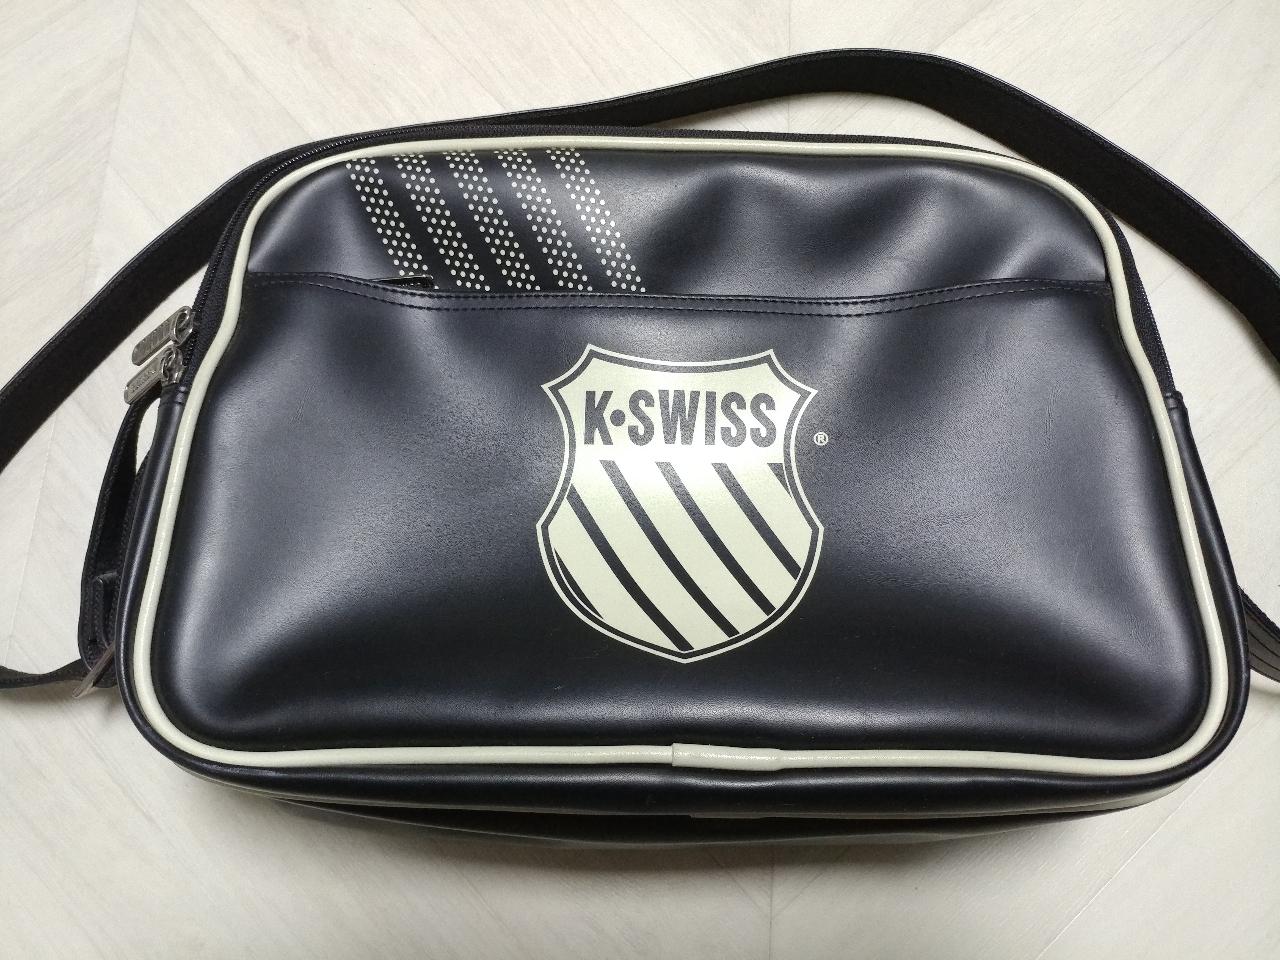 K•SWISS 가방